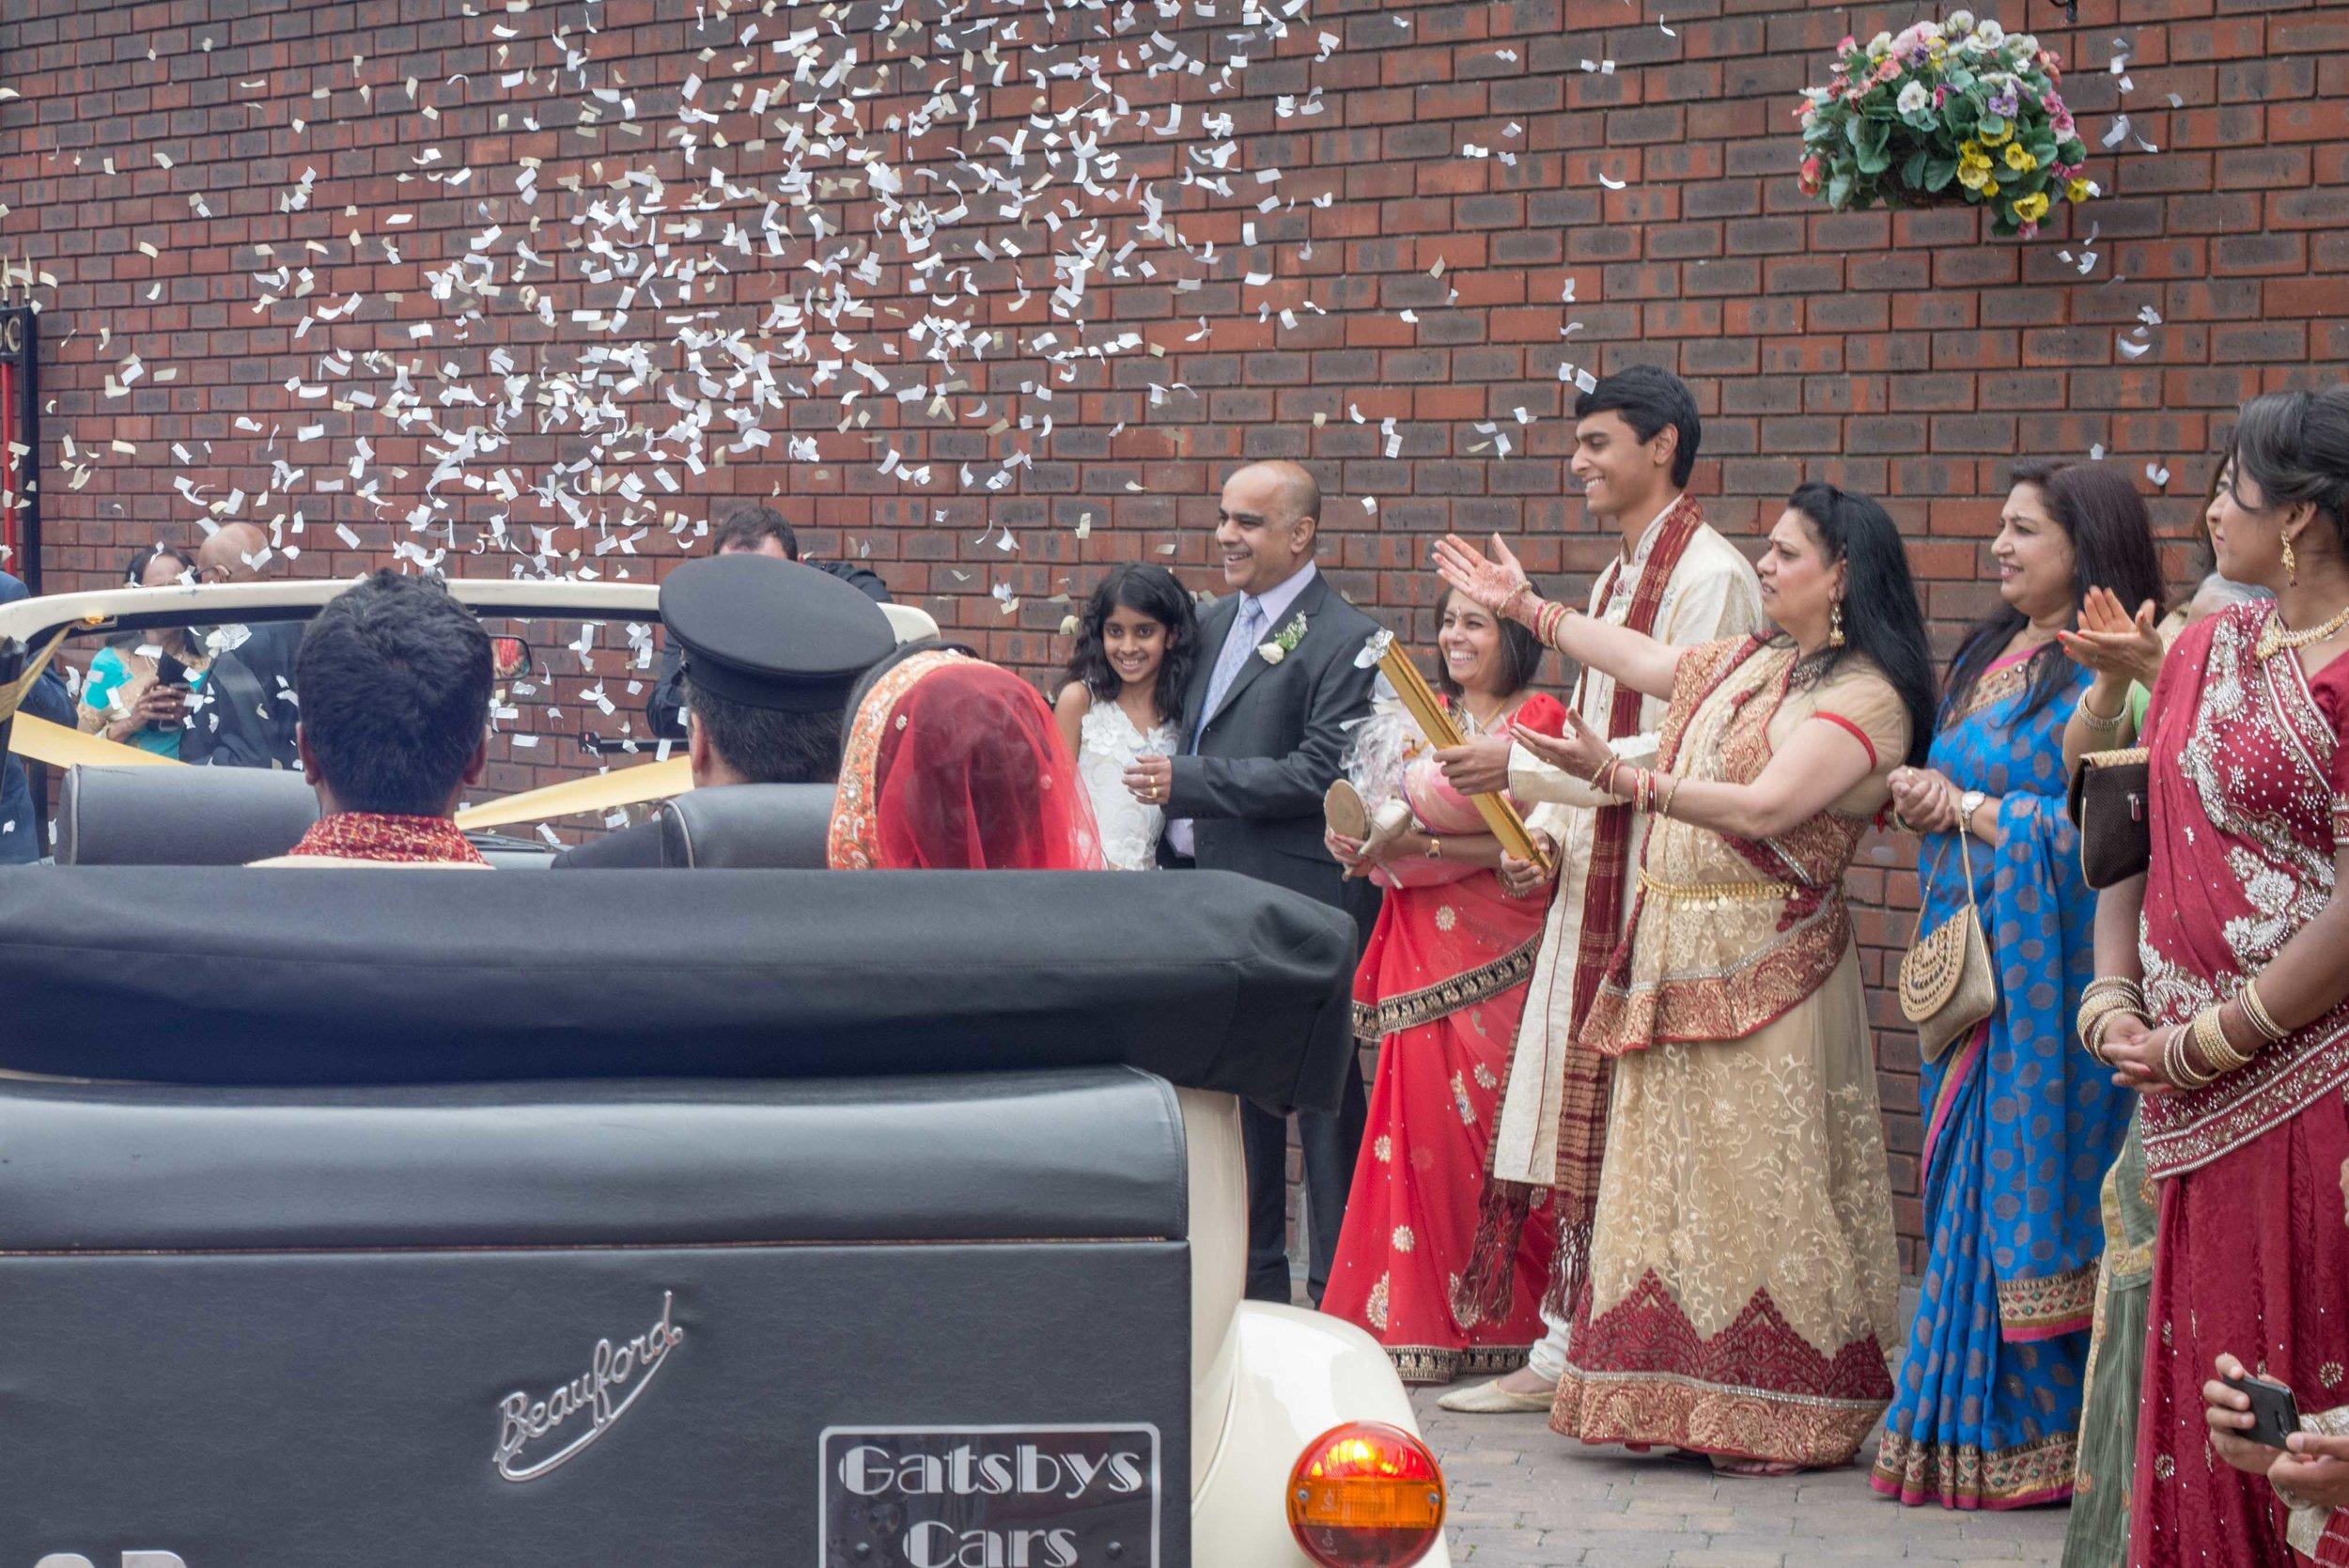 premier-banquetting-london-Hindu-asian-wedding-photographer-natalia-smith-photography-53.jpg